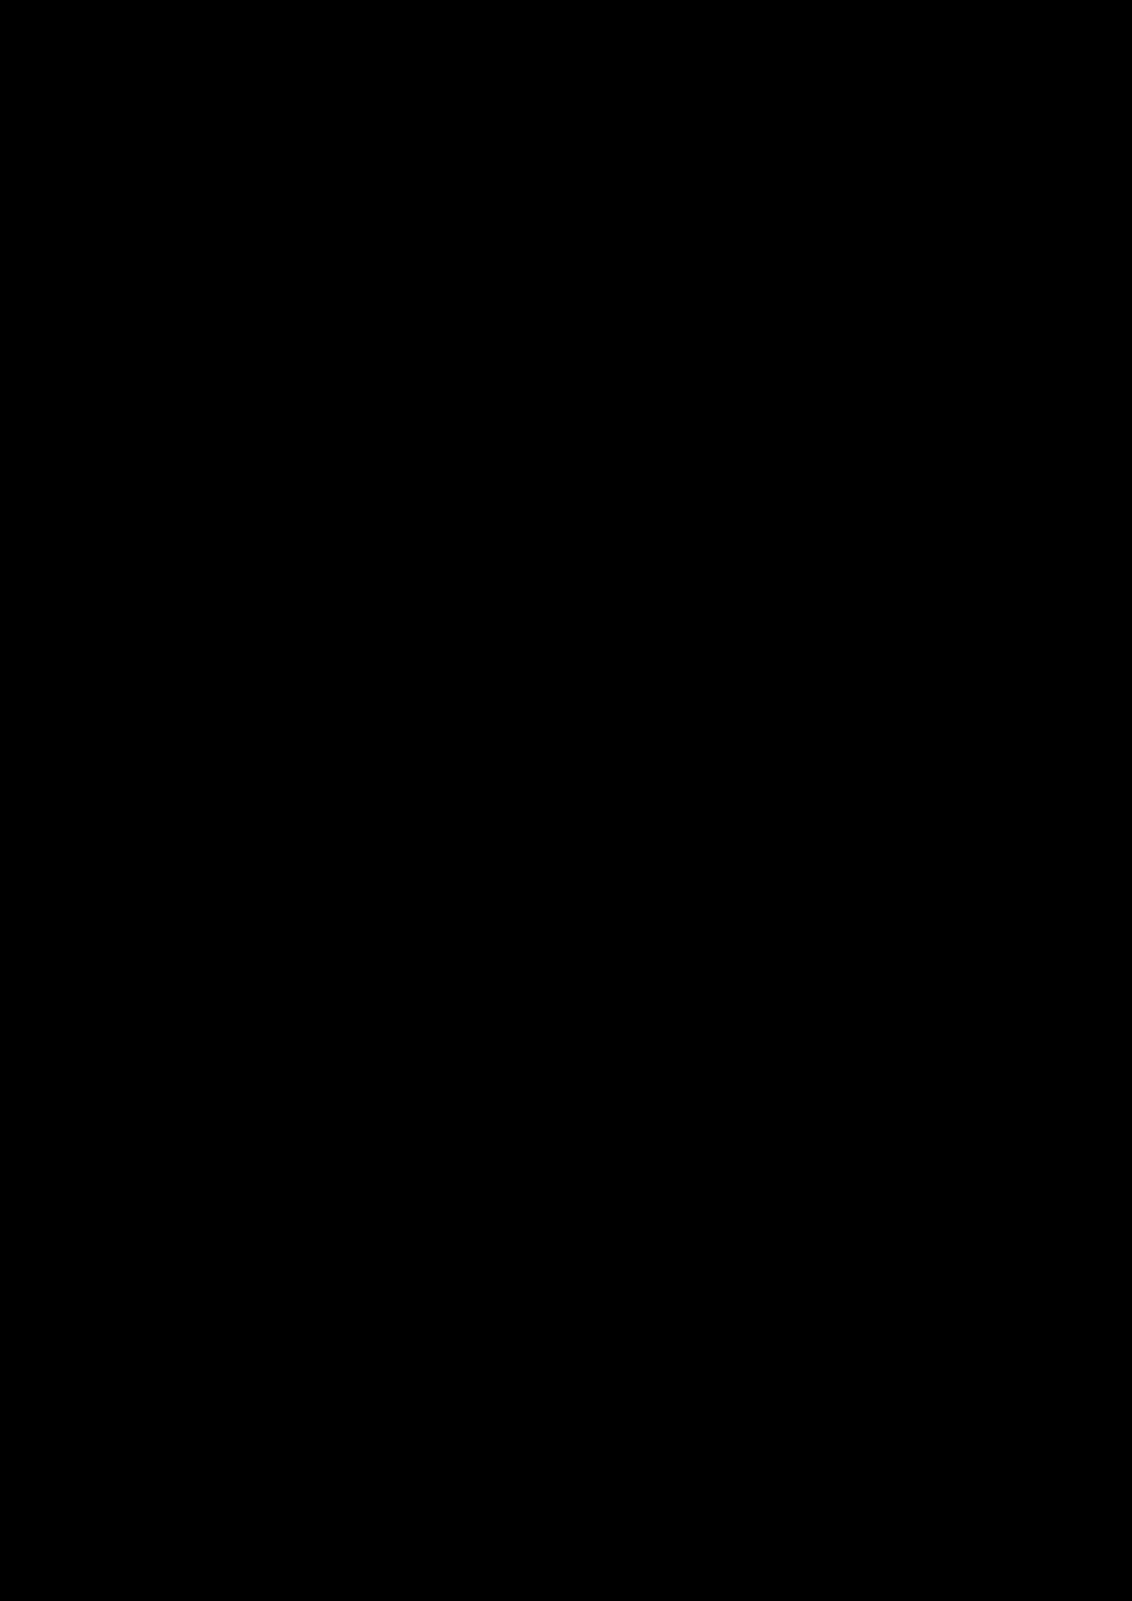 Belyiy sokol slide, Image 109